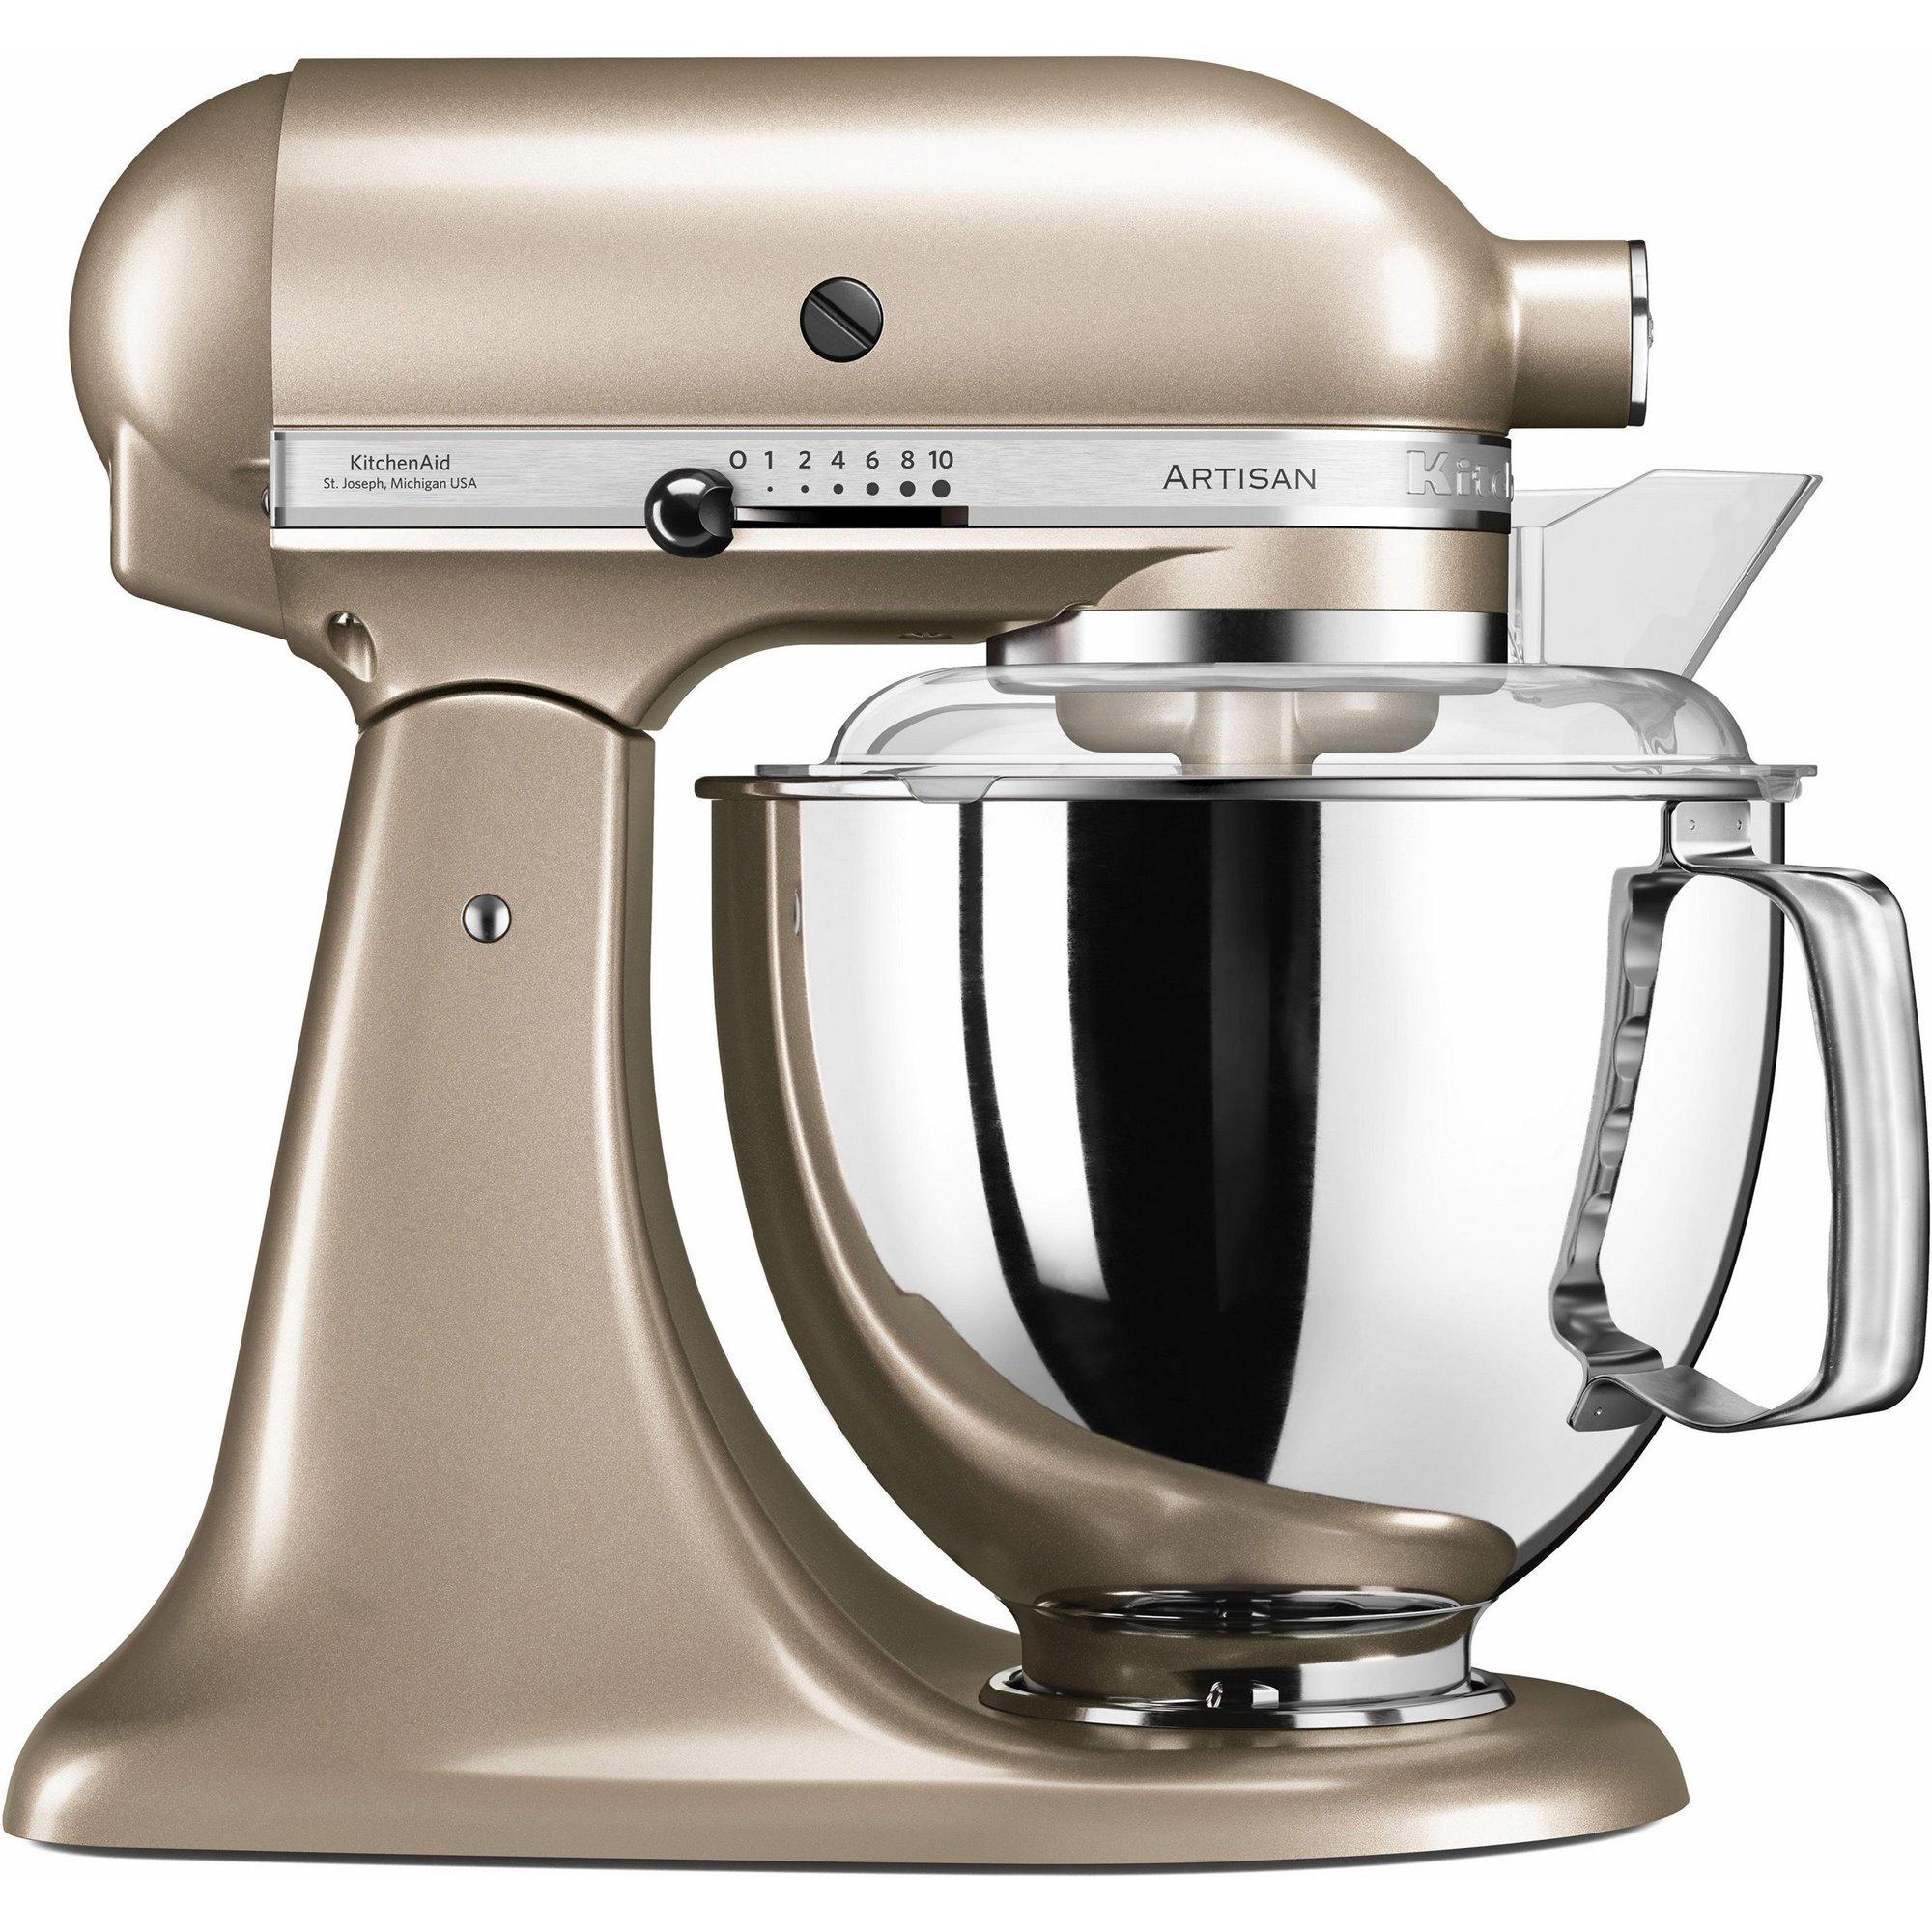 Mixer cu bol Artisan Elegance 5KSM175PSECZ 48 L Golden Nectar 300W KitchenAid